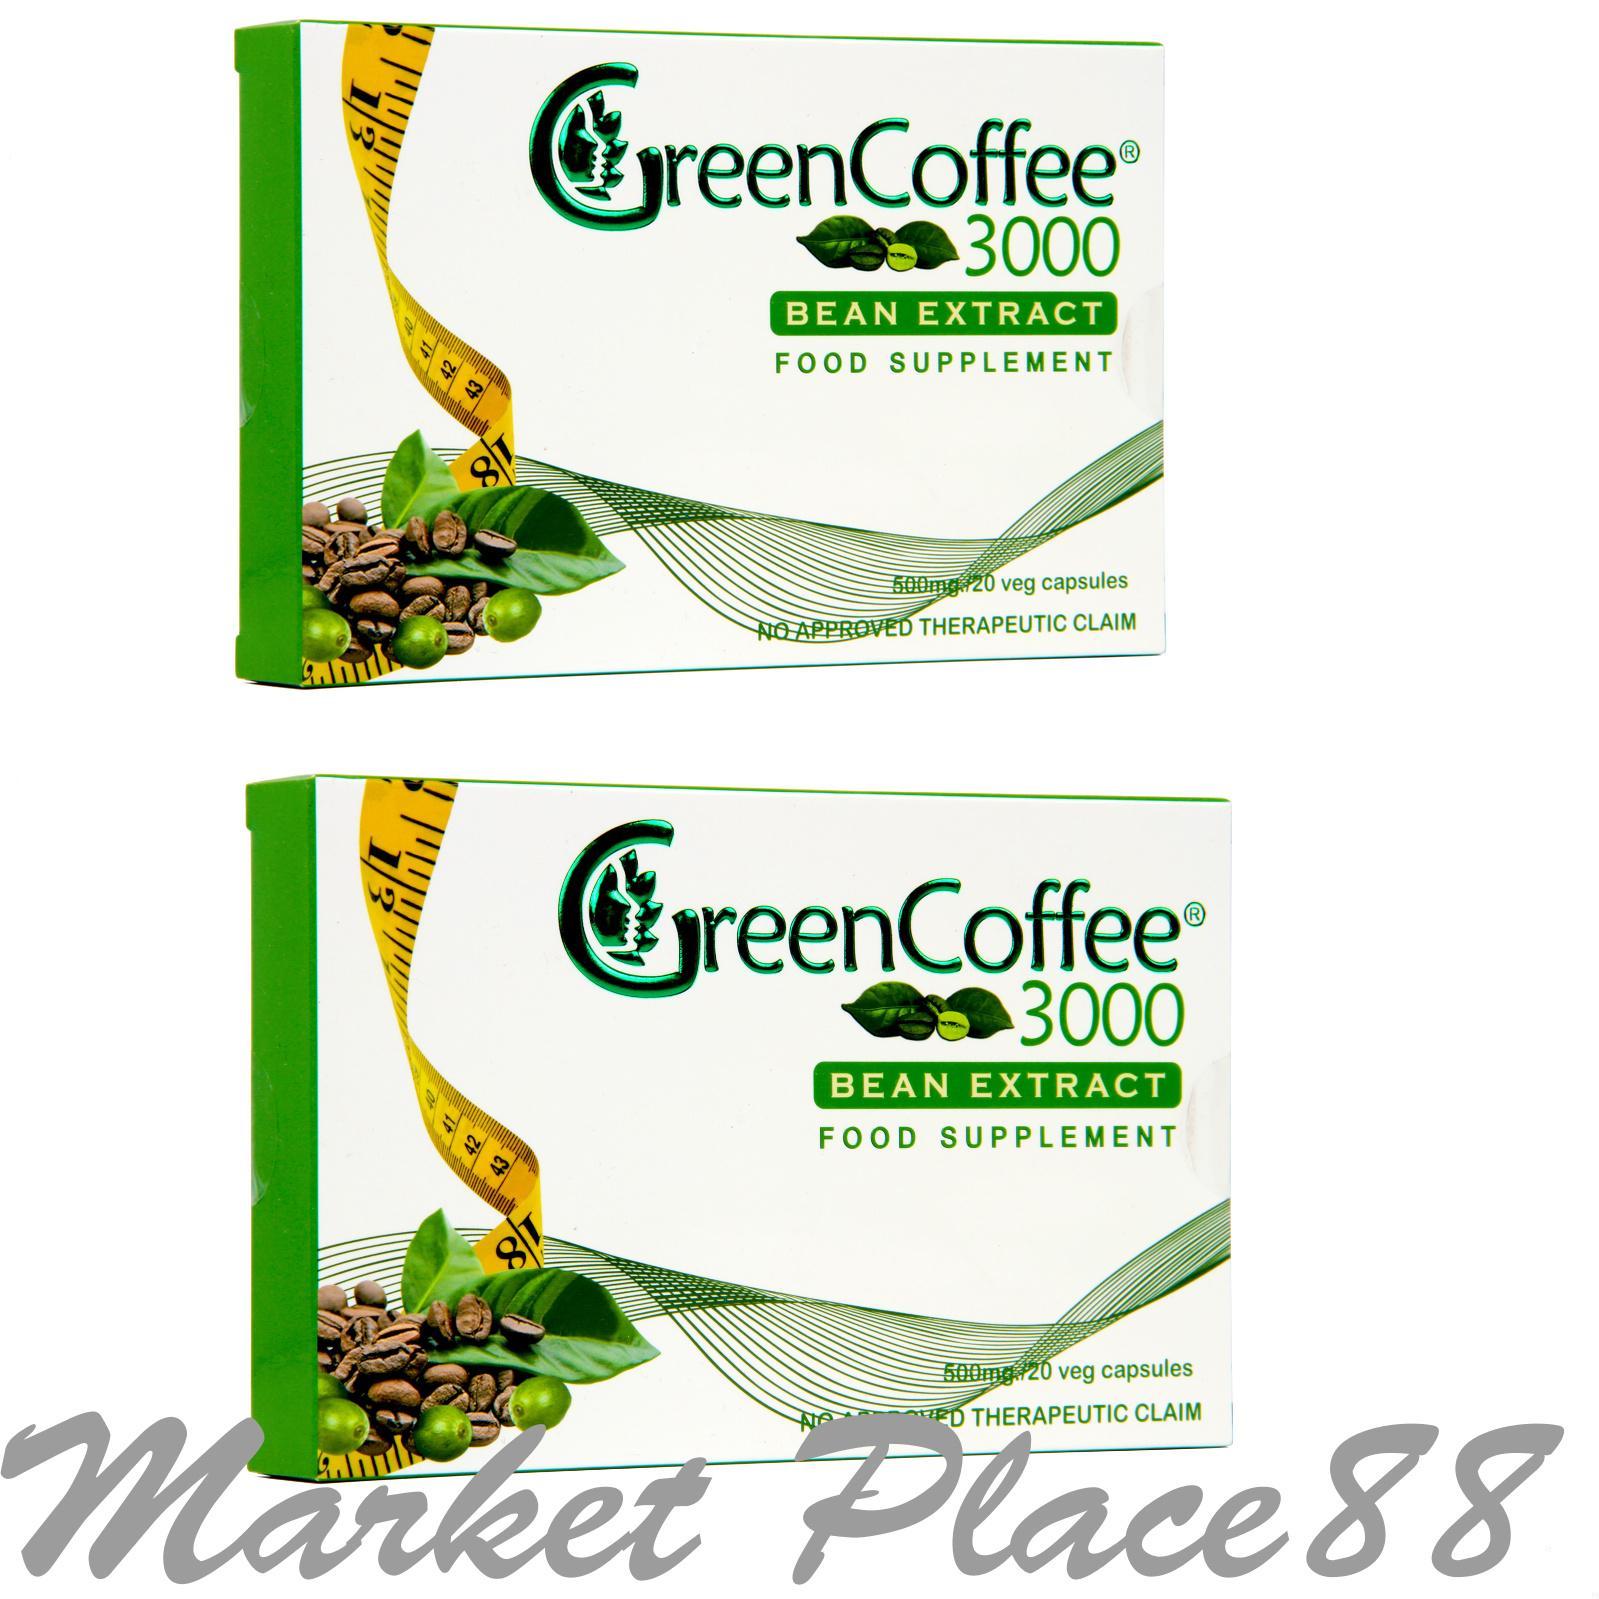 Green Coffee Philippines Price List Arabica Capsule Pure Organic 60 Caps 3000 Bean Extract Set Of 2